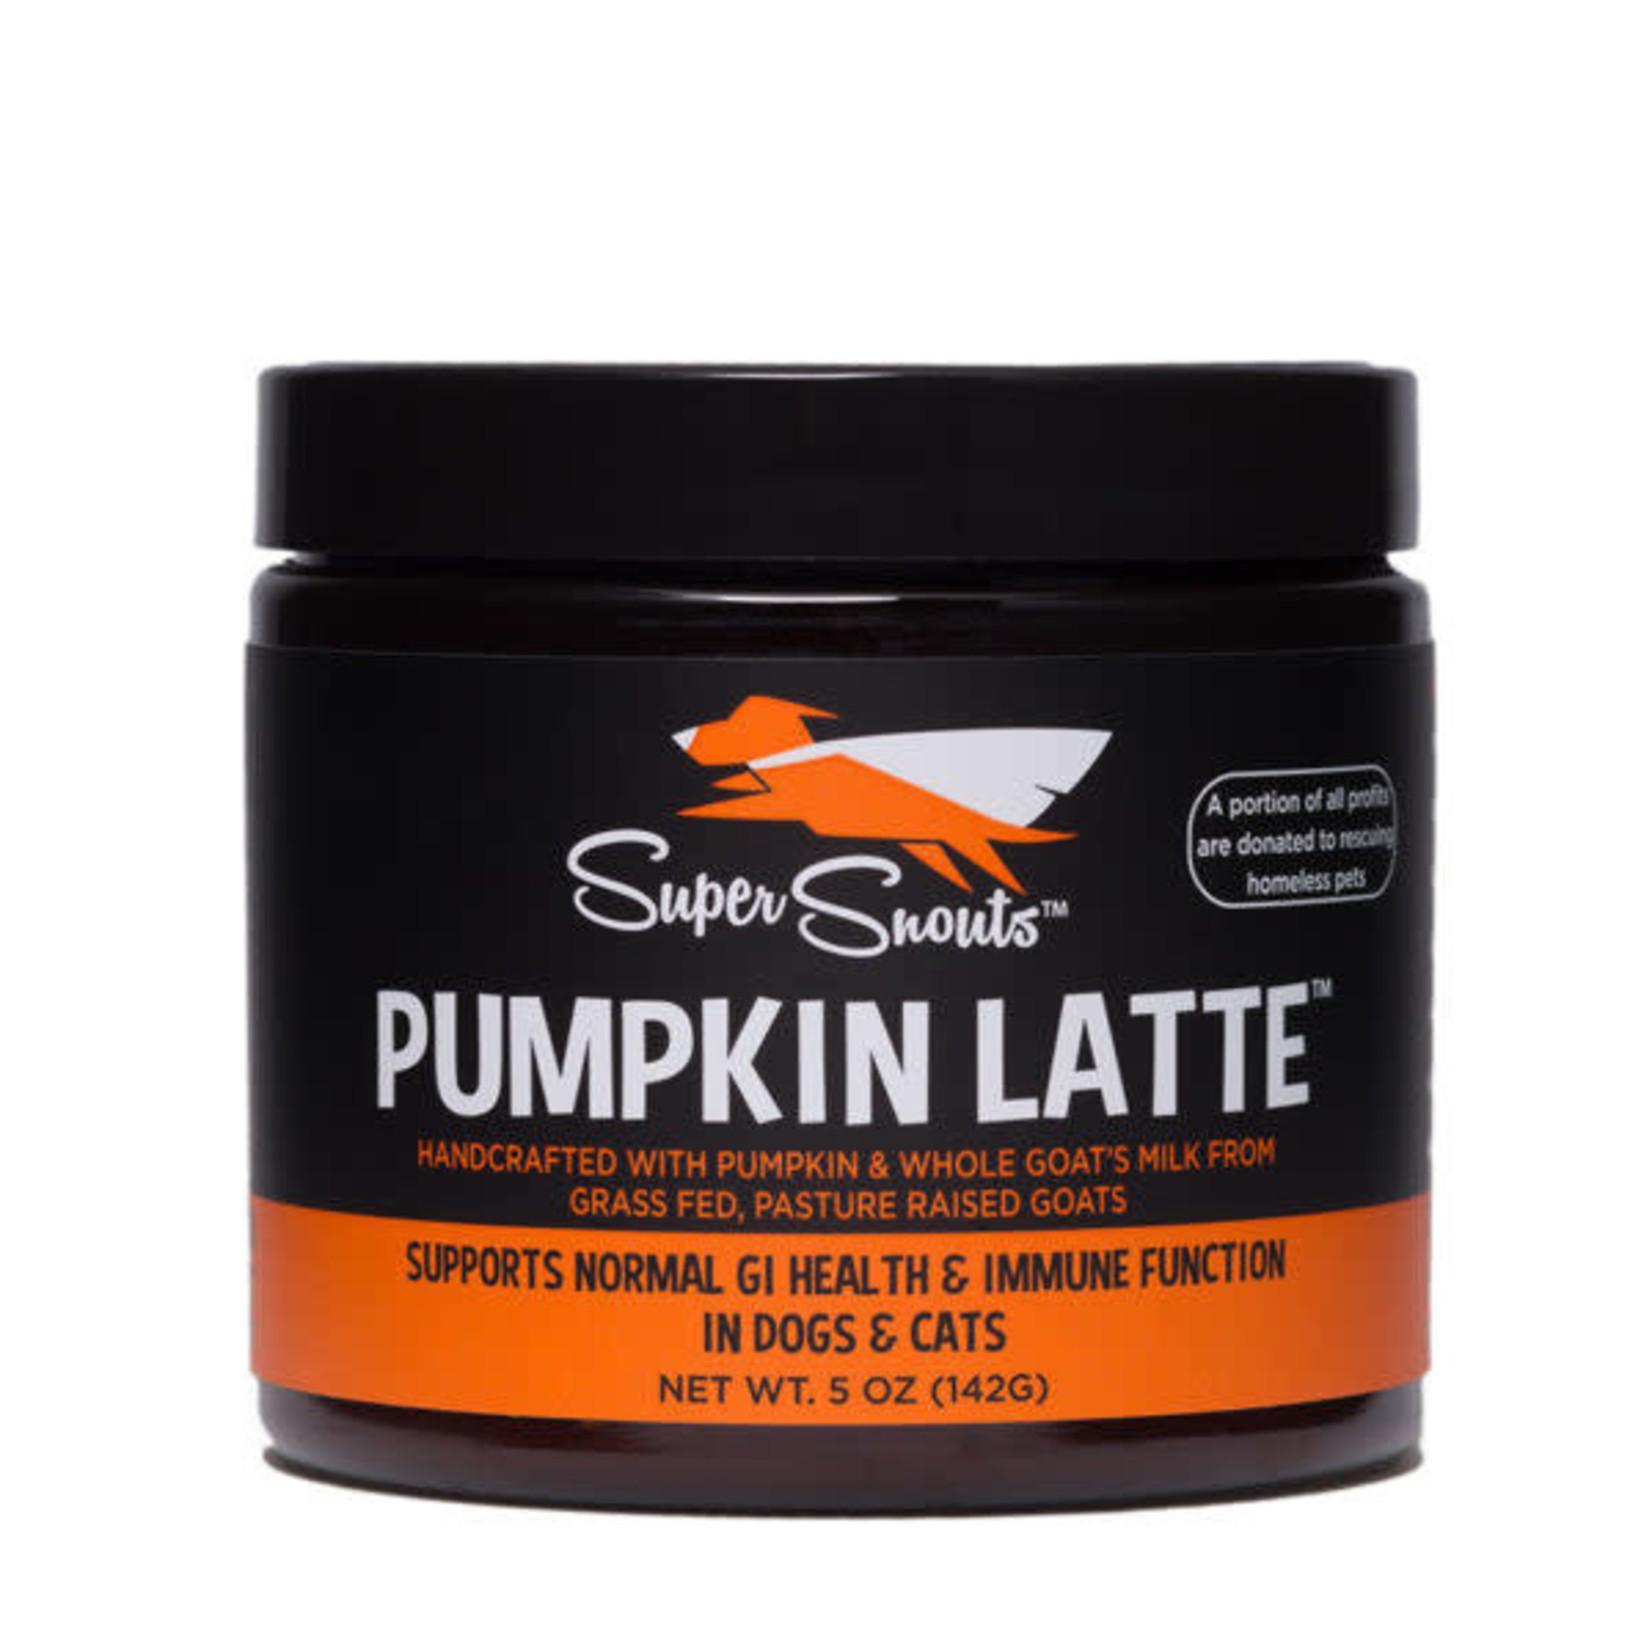 Diggin' / Super Snouts Super Snouts Pumpkin Latte 5 OZ